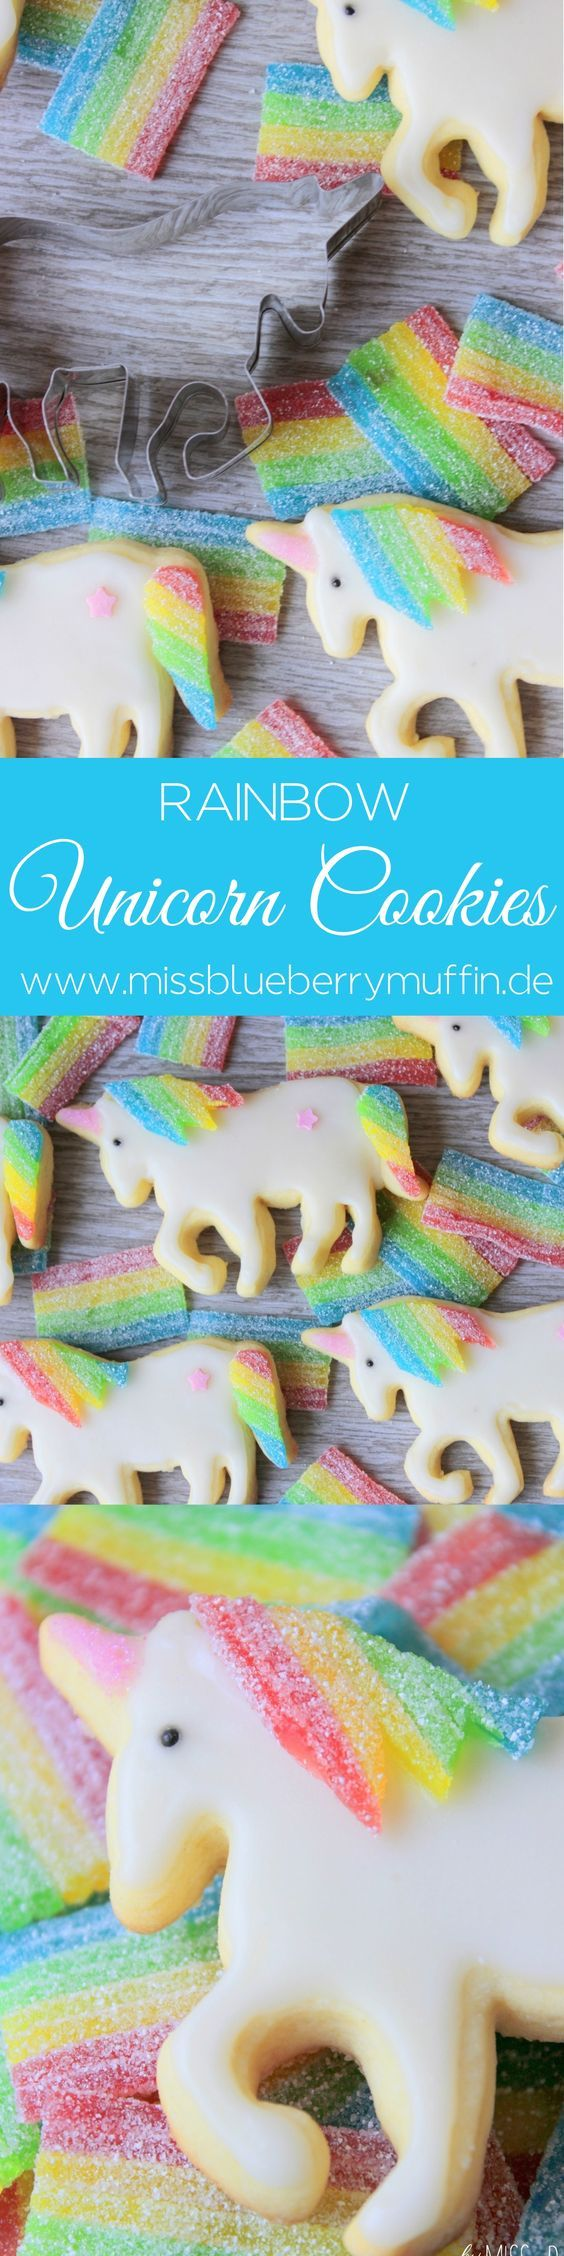 Regenbogen-Einhorn-Cookies! Süßer geht es nicht! <3 // Rainbow Unicorn Cookies | foodieeee | Pinterest